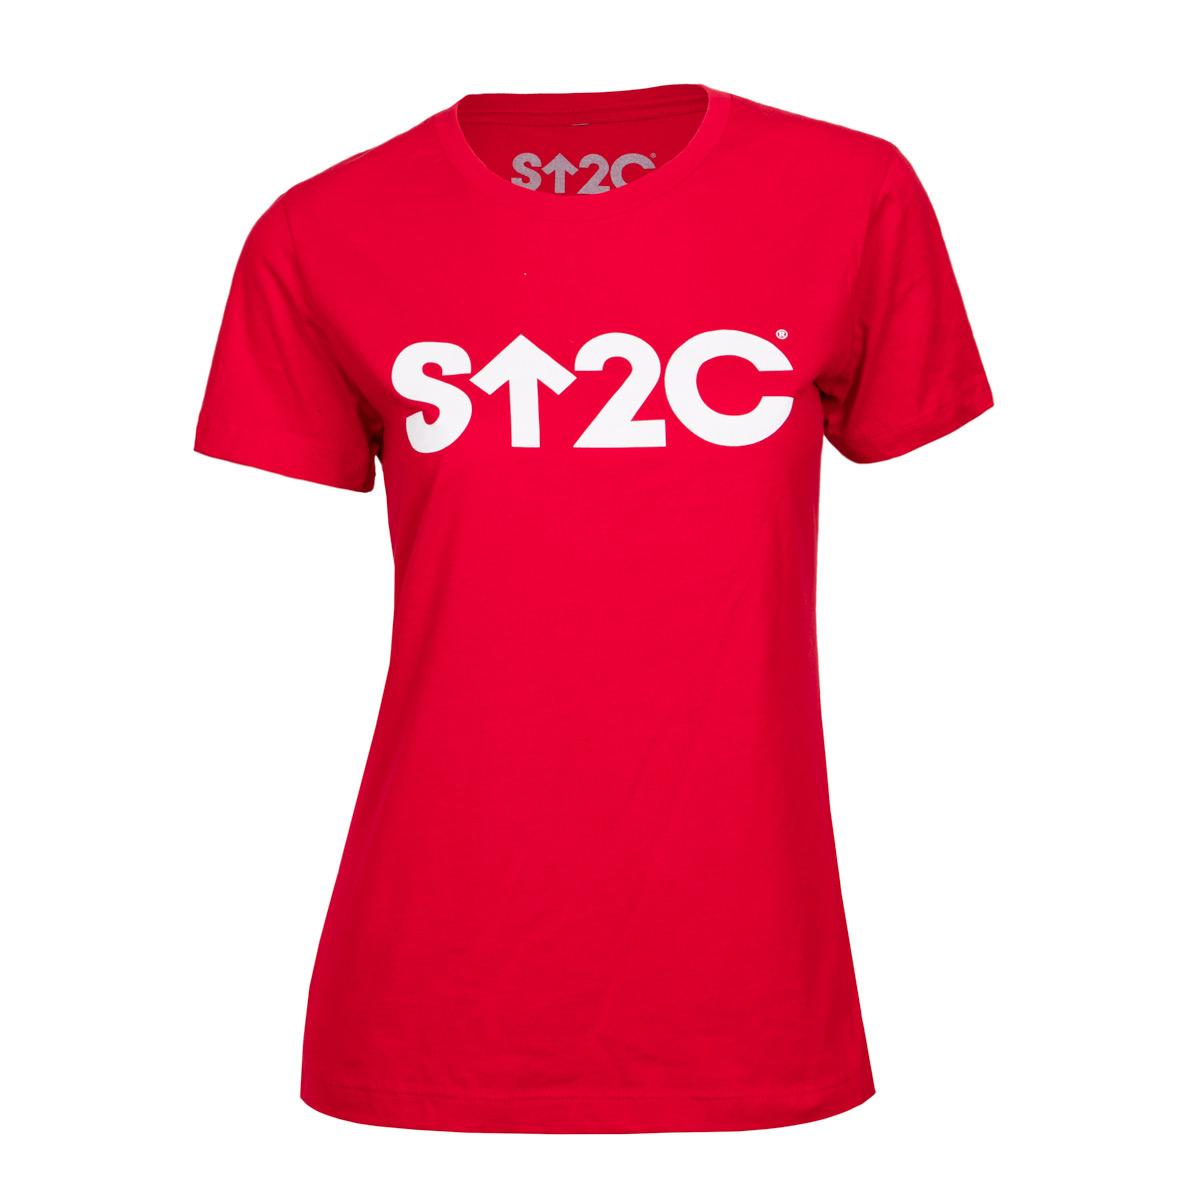 SU2C Women's Short Logo Boyfriend T-shirt, Red